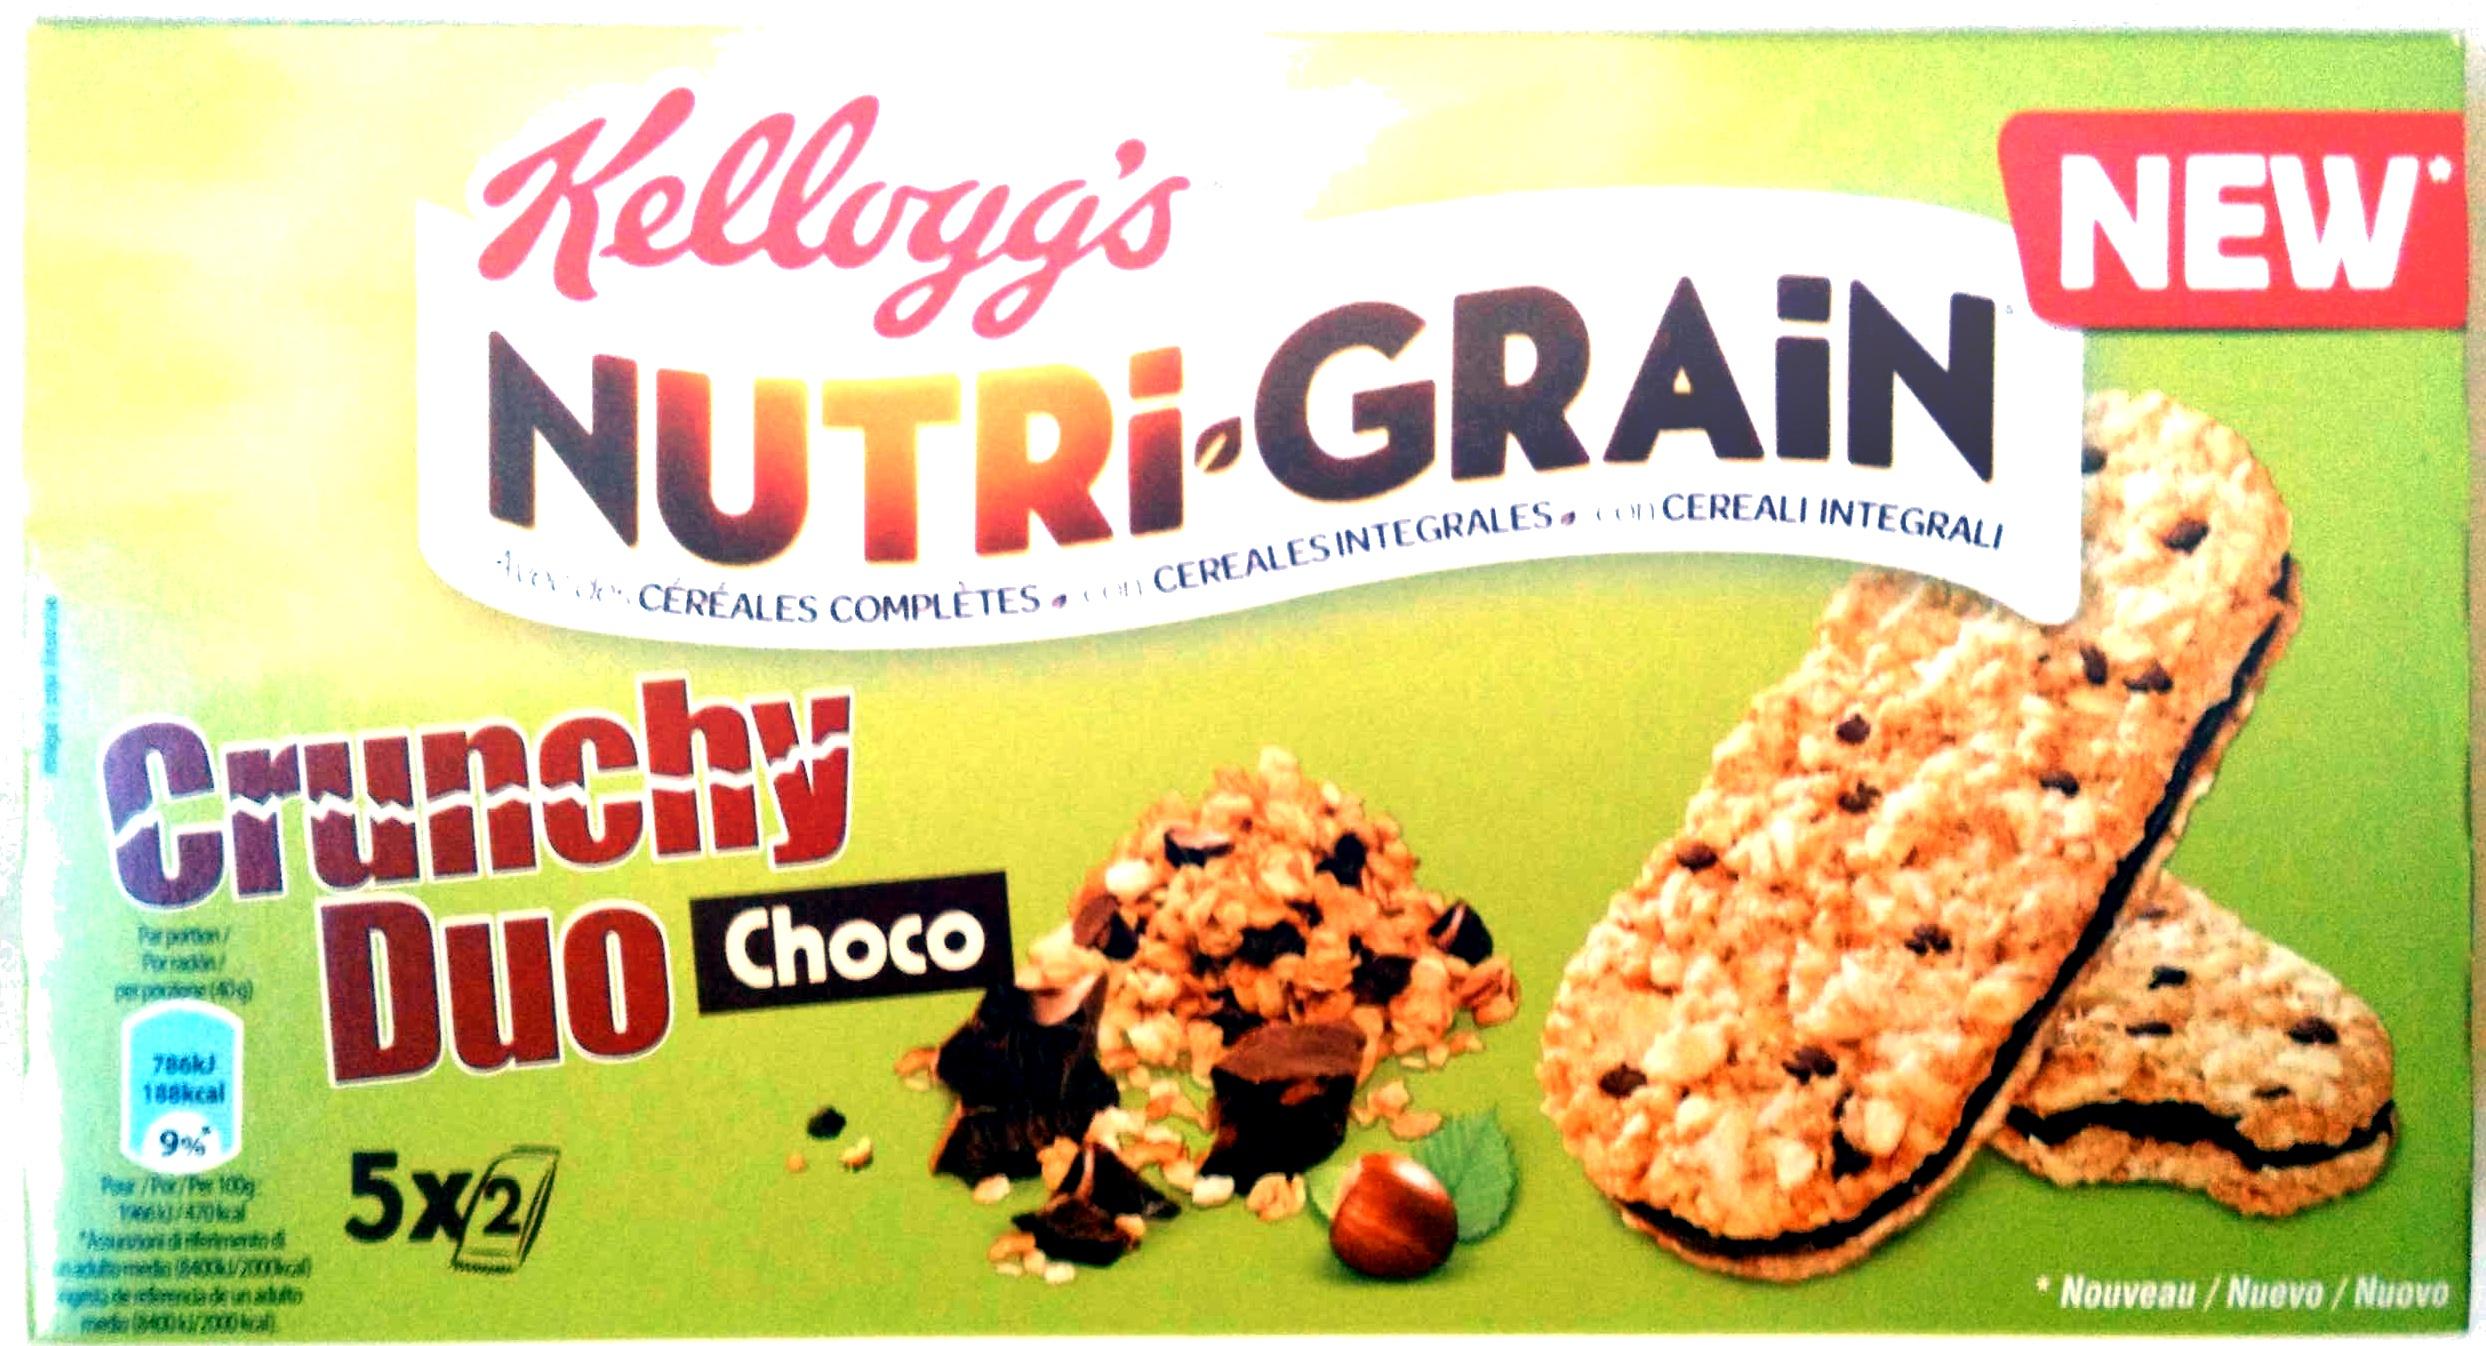 Nutri-Grain crunchy duo choco - Prodotto